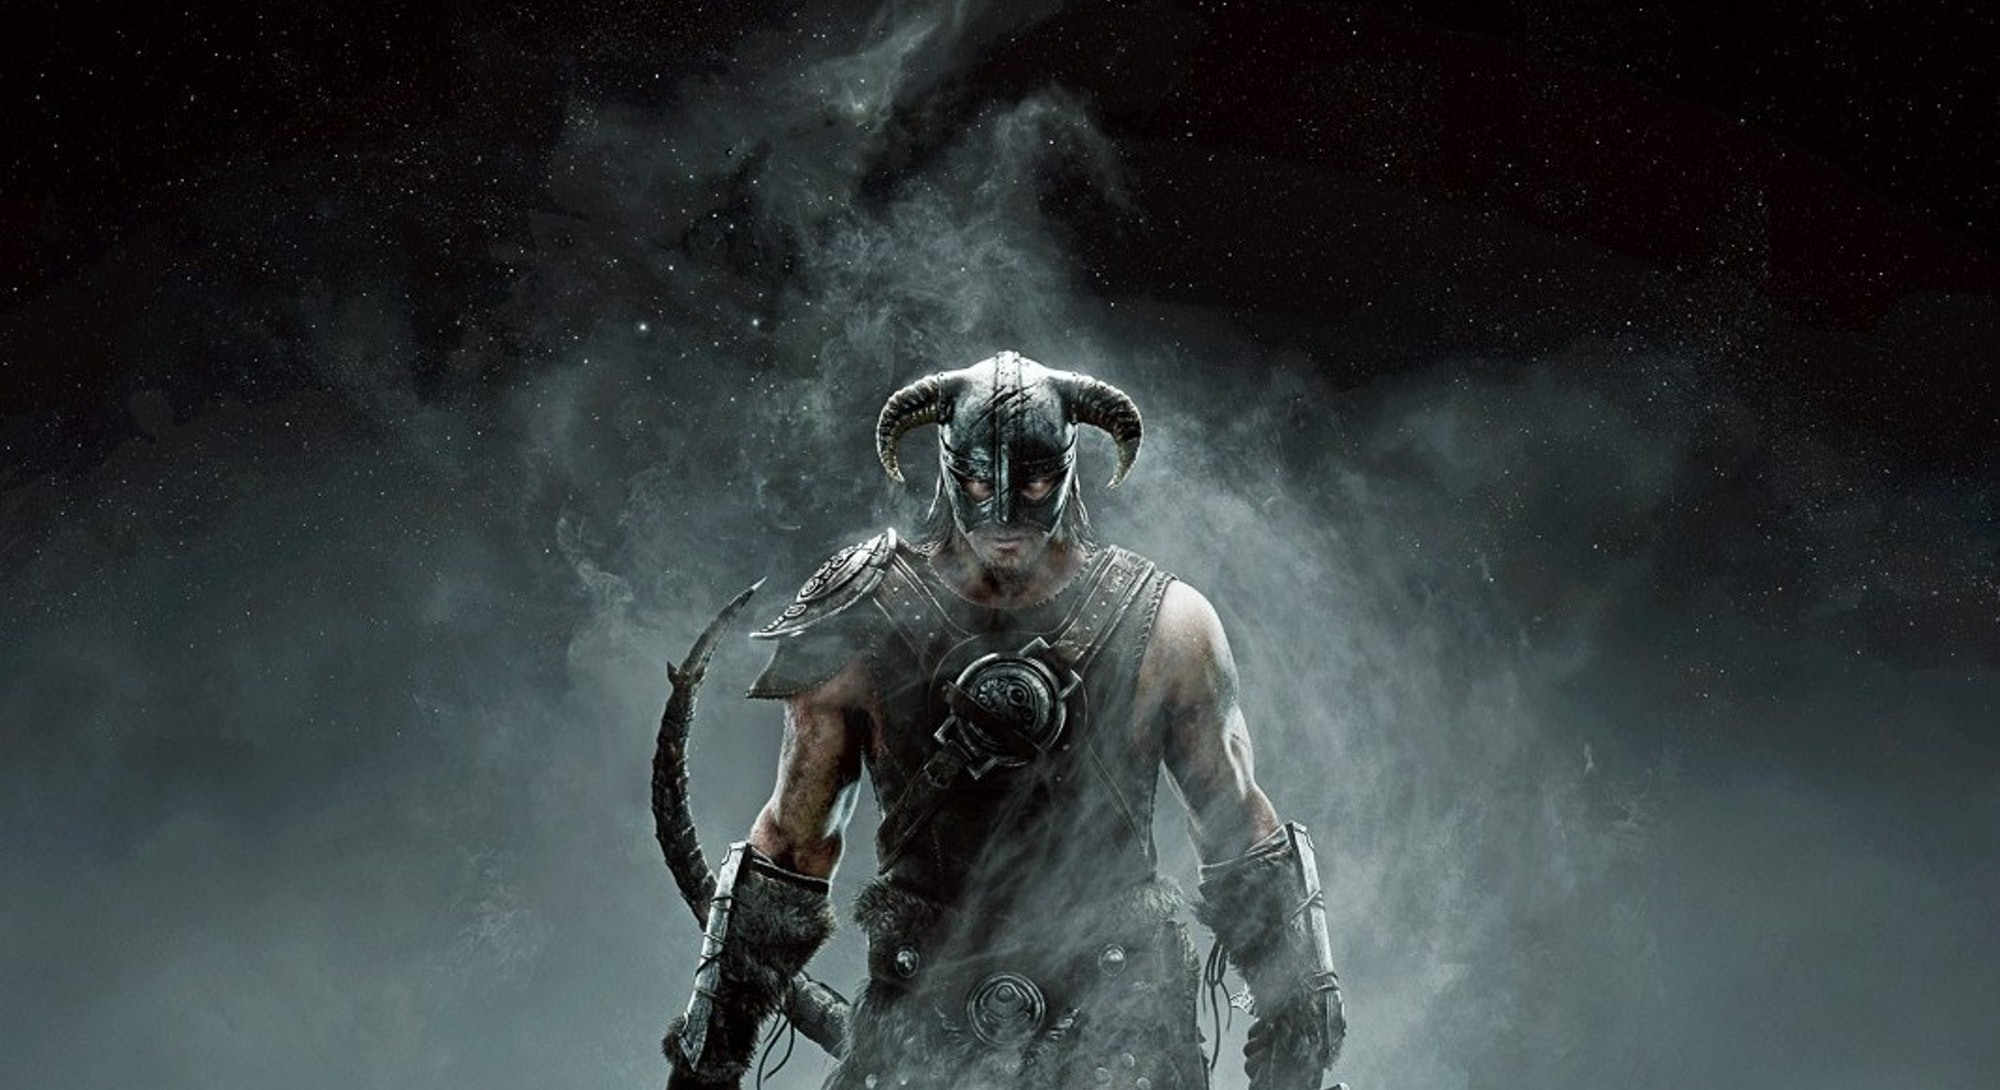 dragonborn from The Elder Scrolls 5: Skyrim